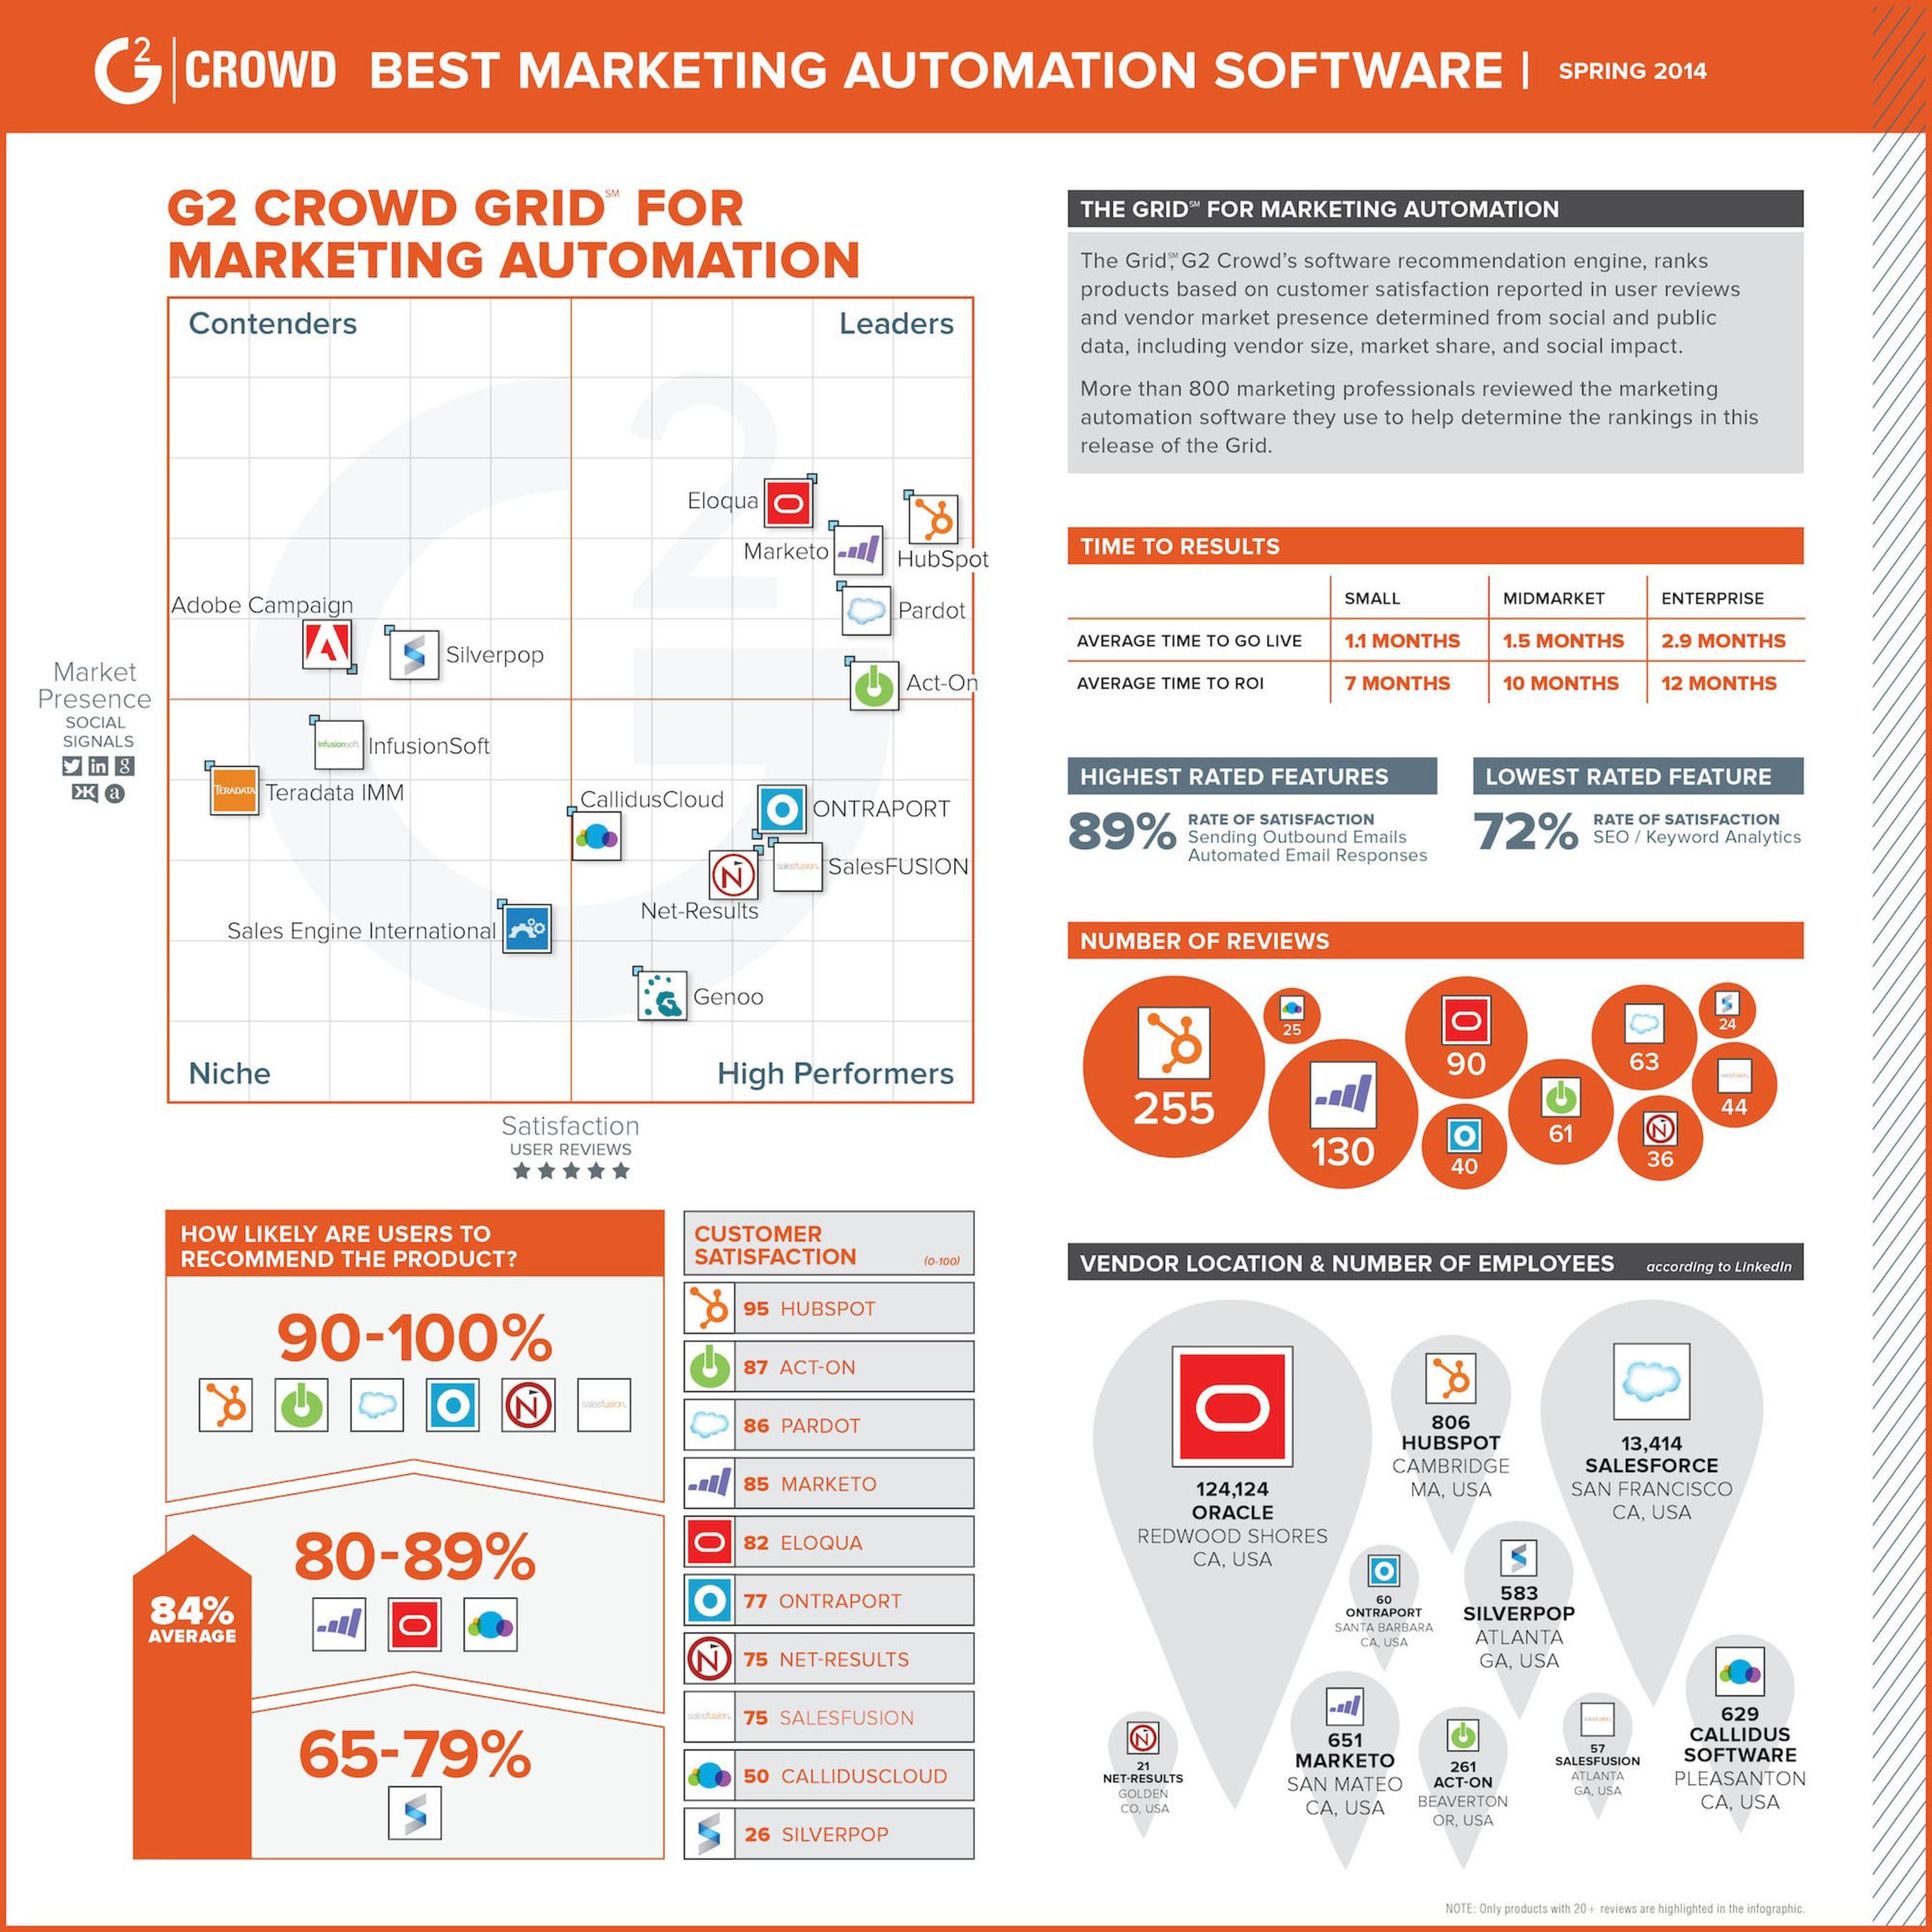 Infographic: Best Marketing Automation Software. (PRNewsFoto/G2 Crowd) (PRNewsFoto/G2 CROWD)